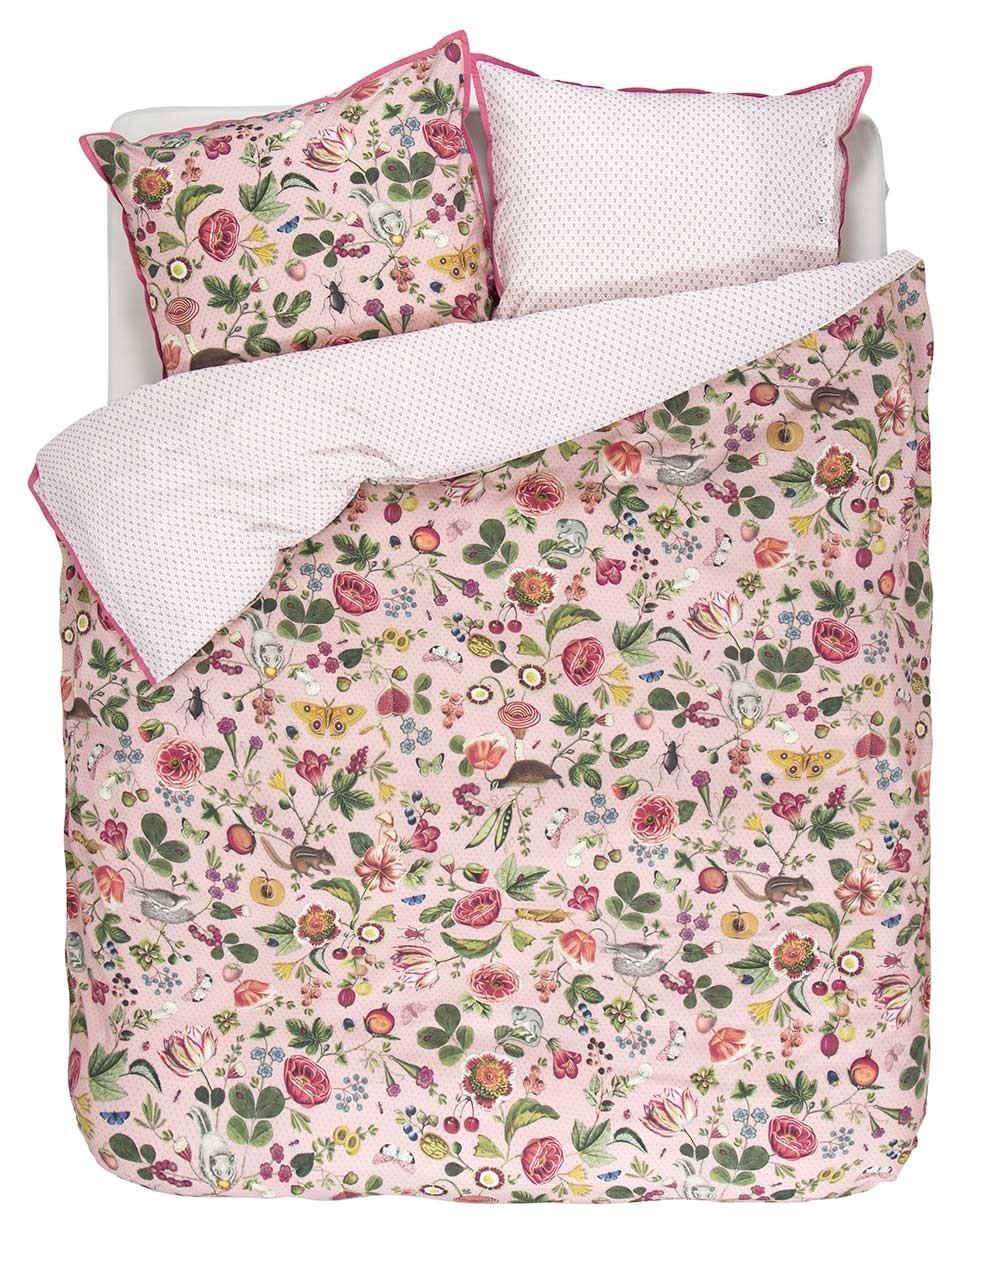 pip studio sengetøj Køb PiP Studio sengetøj i Woodsy Pink her pip studio sengetøj